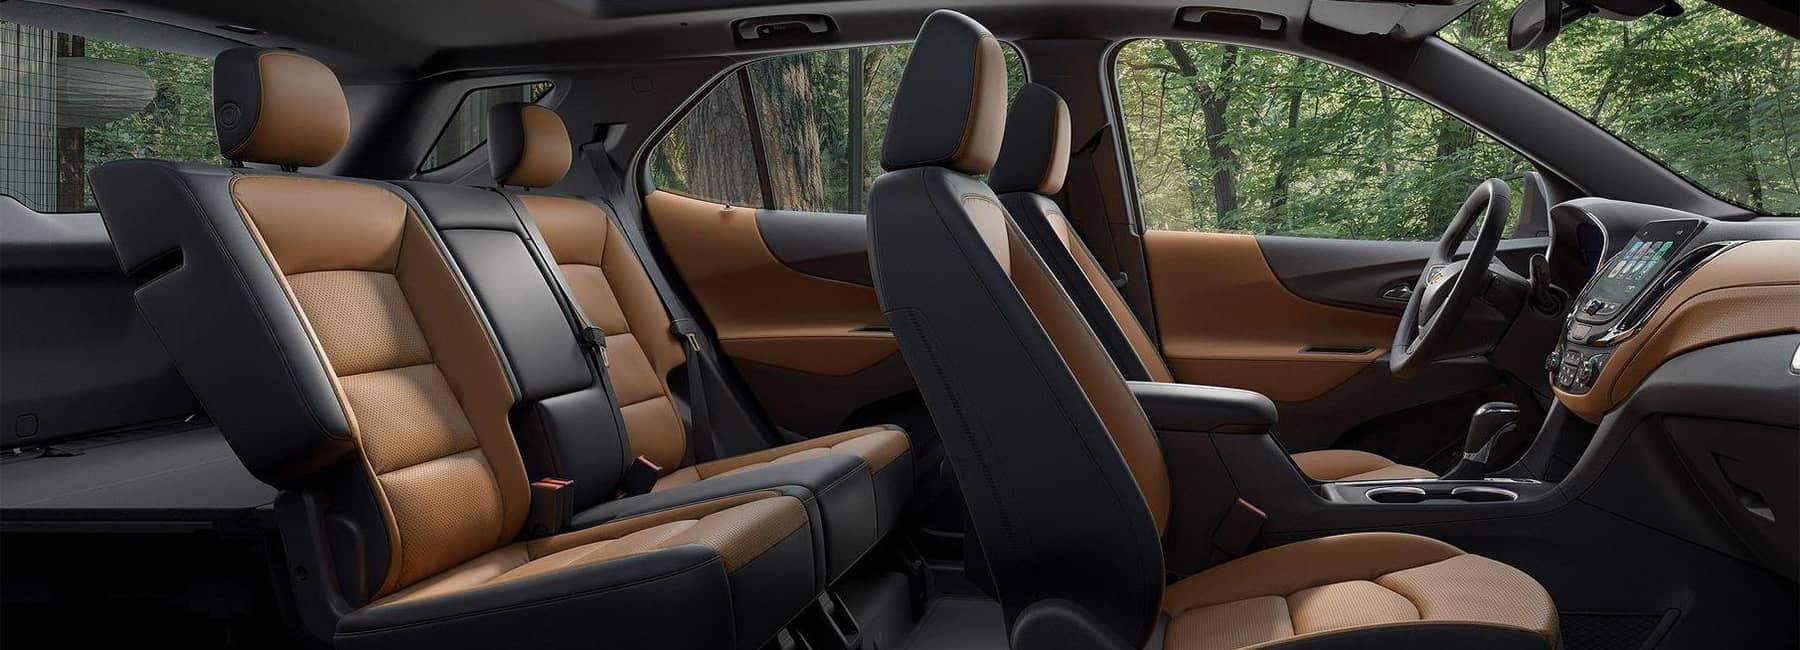 Chevrolet Equinox Interior View